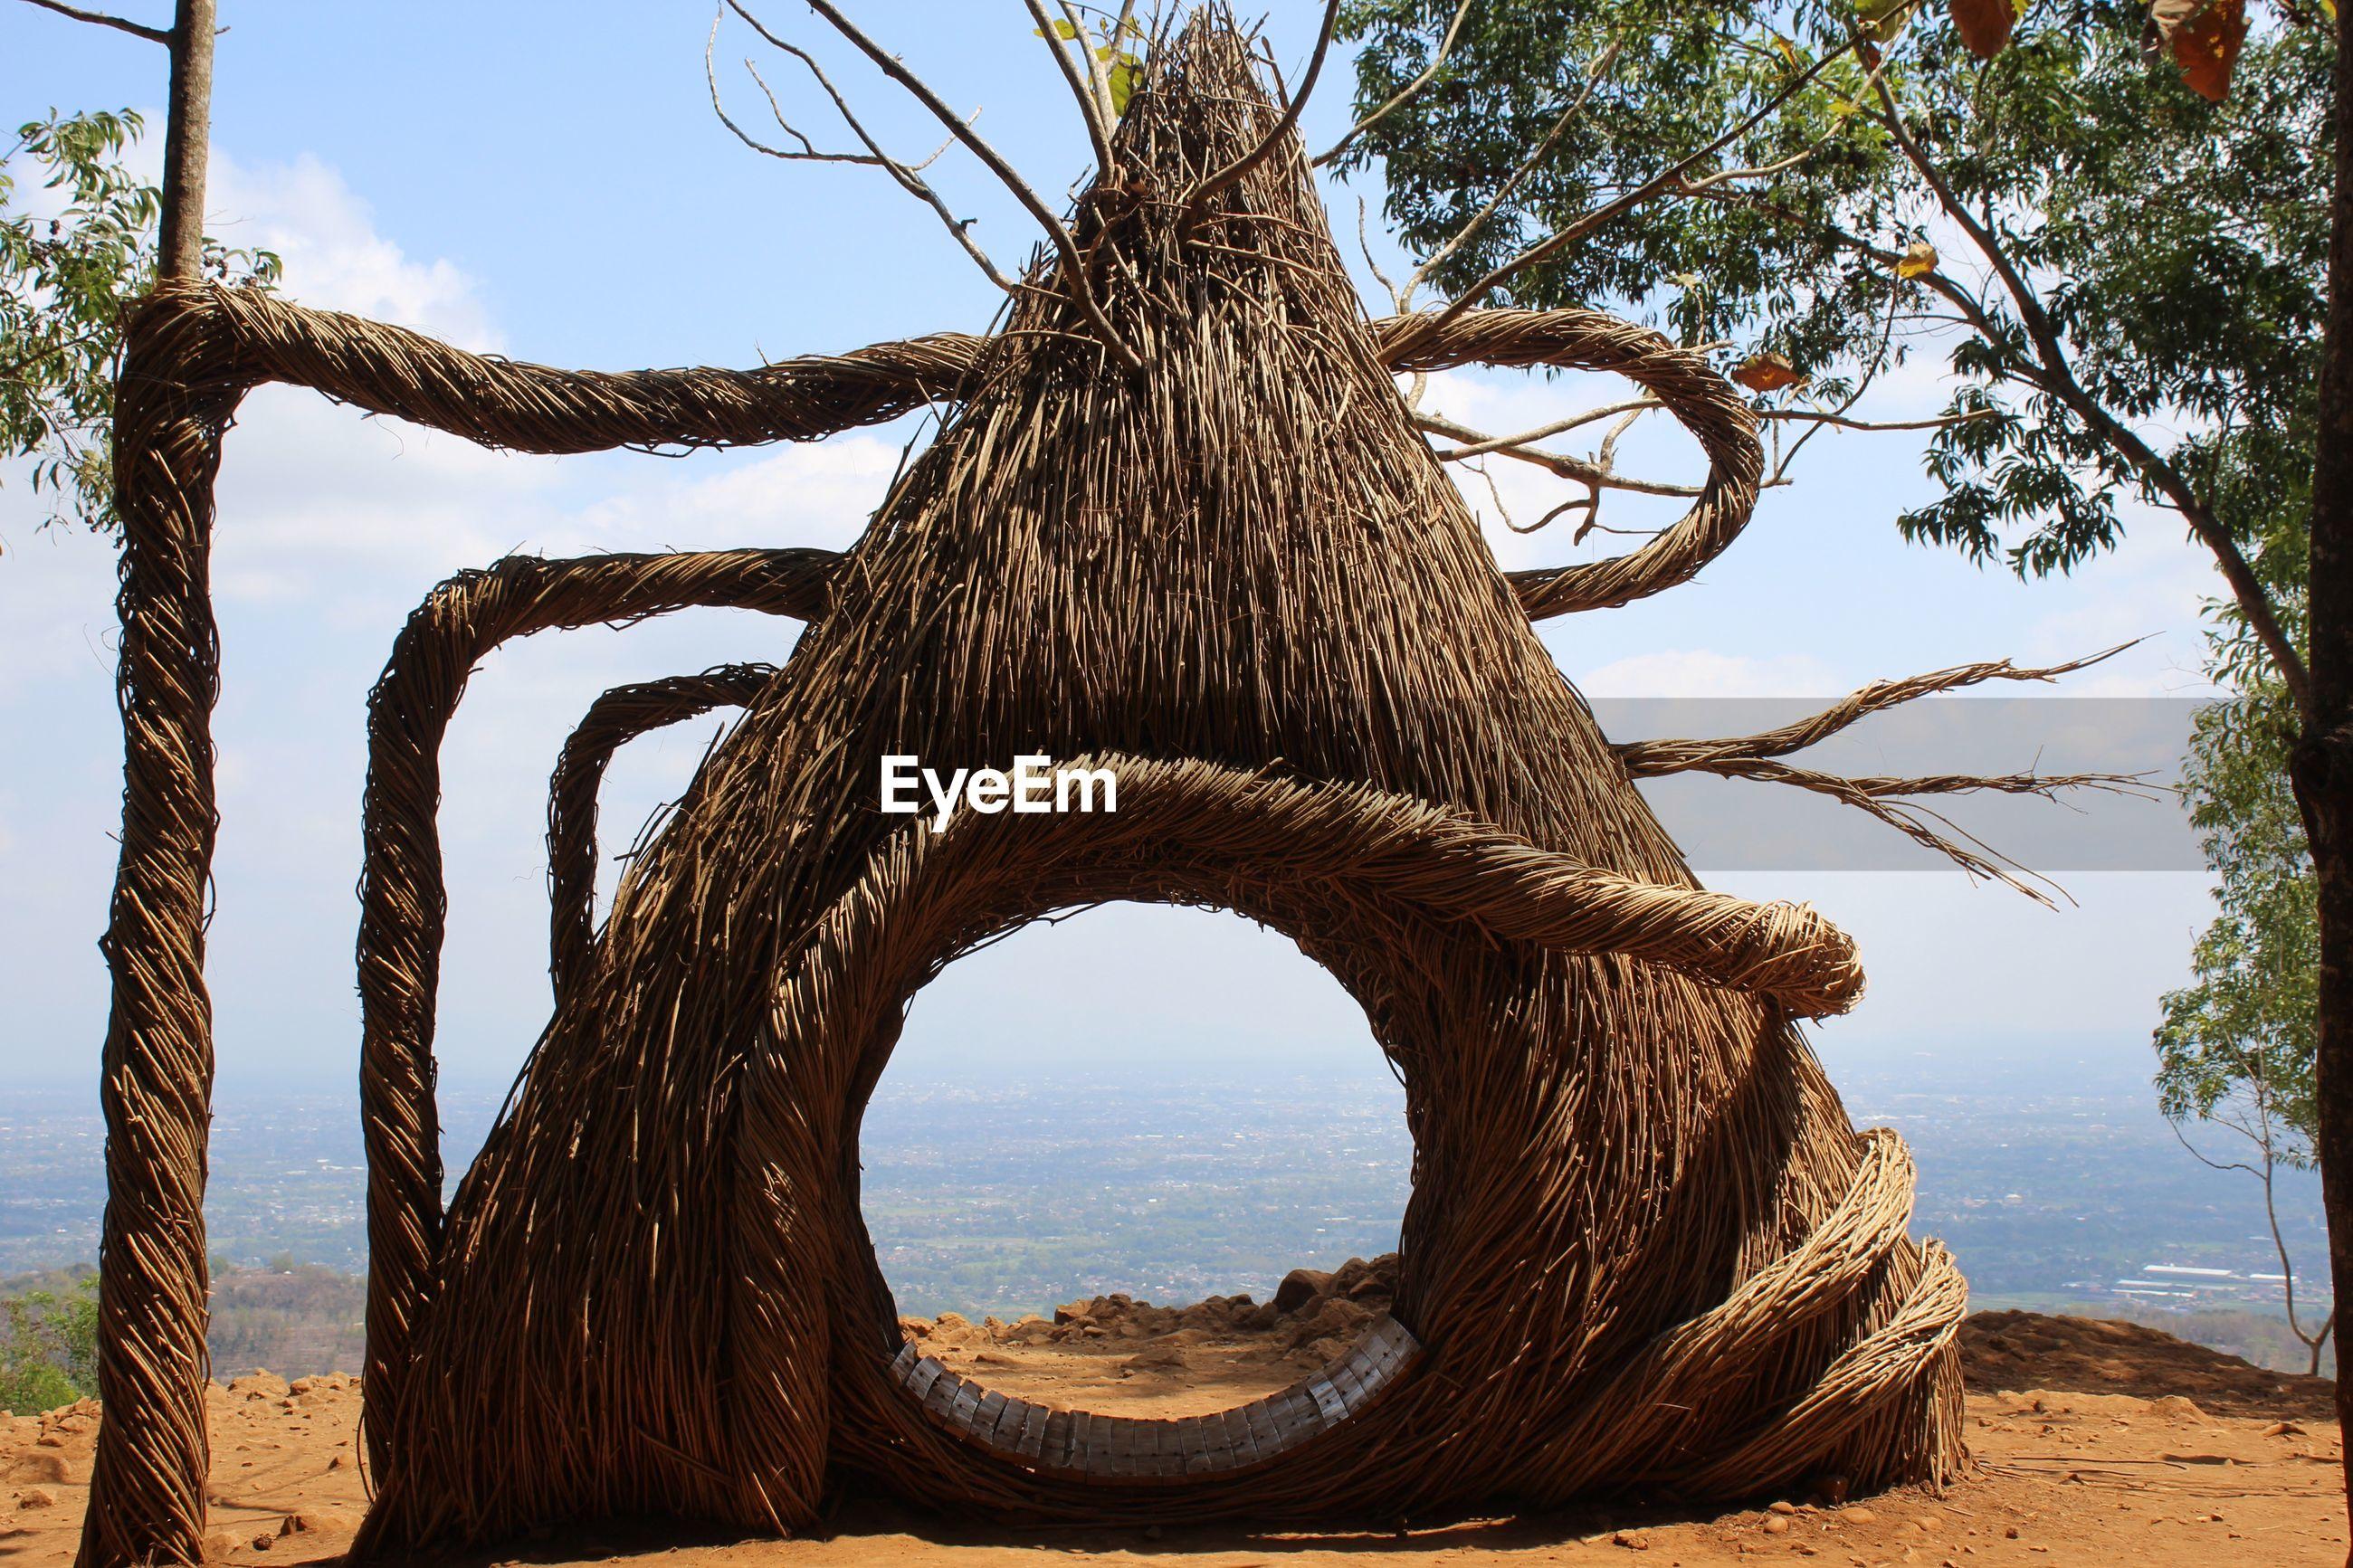 Thatched roof hut against landscape